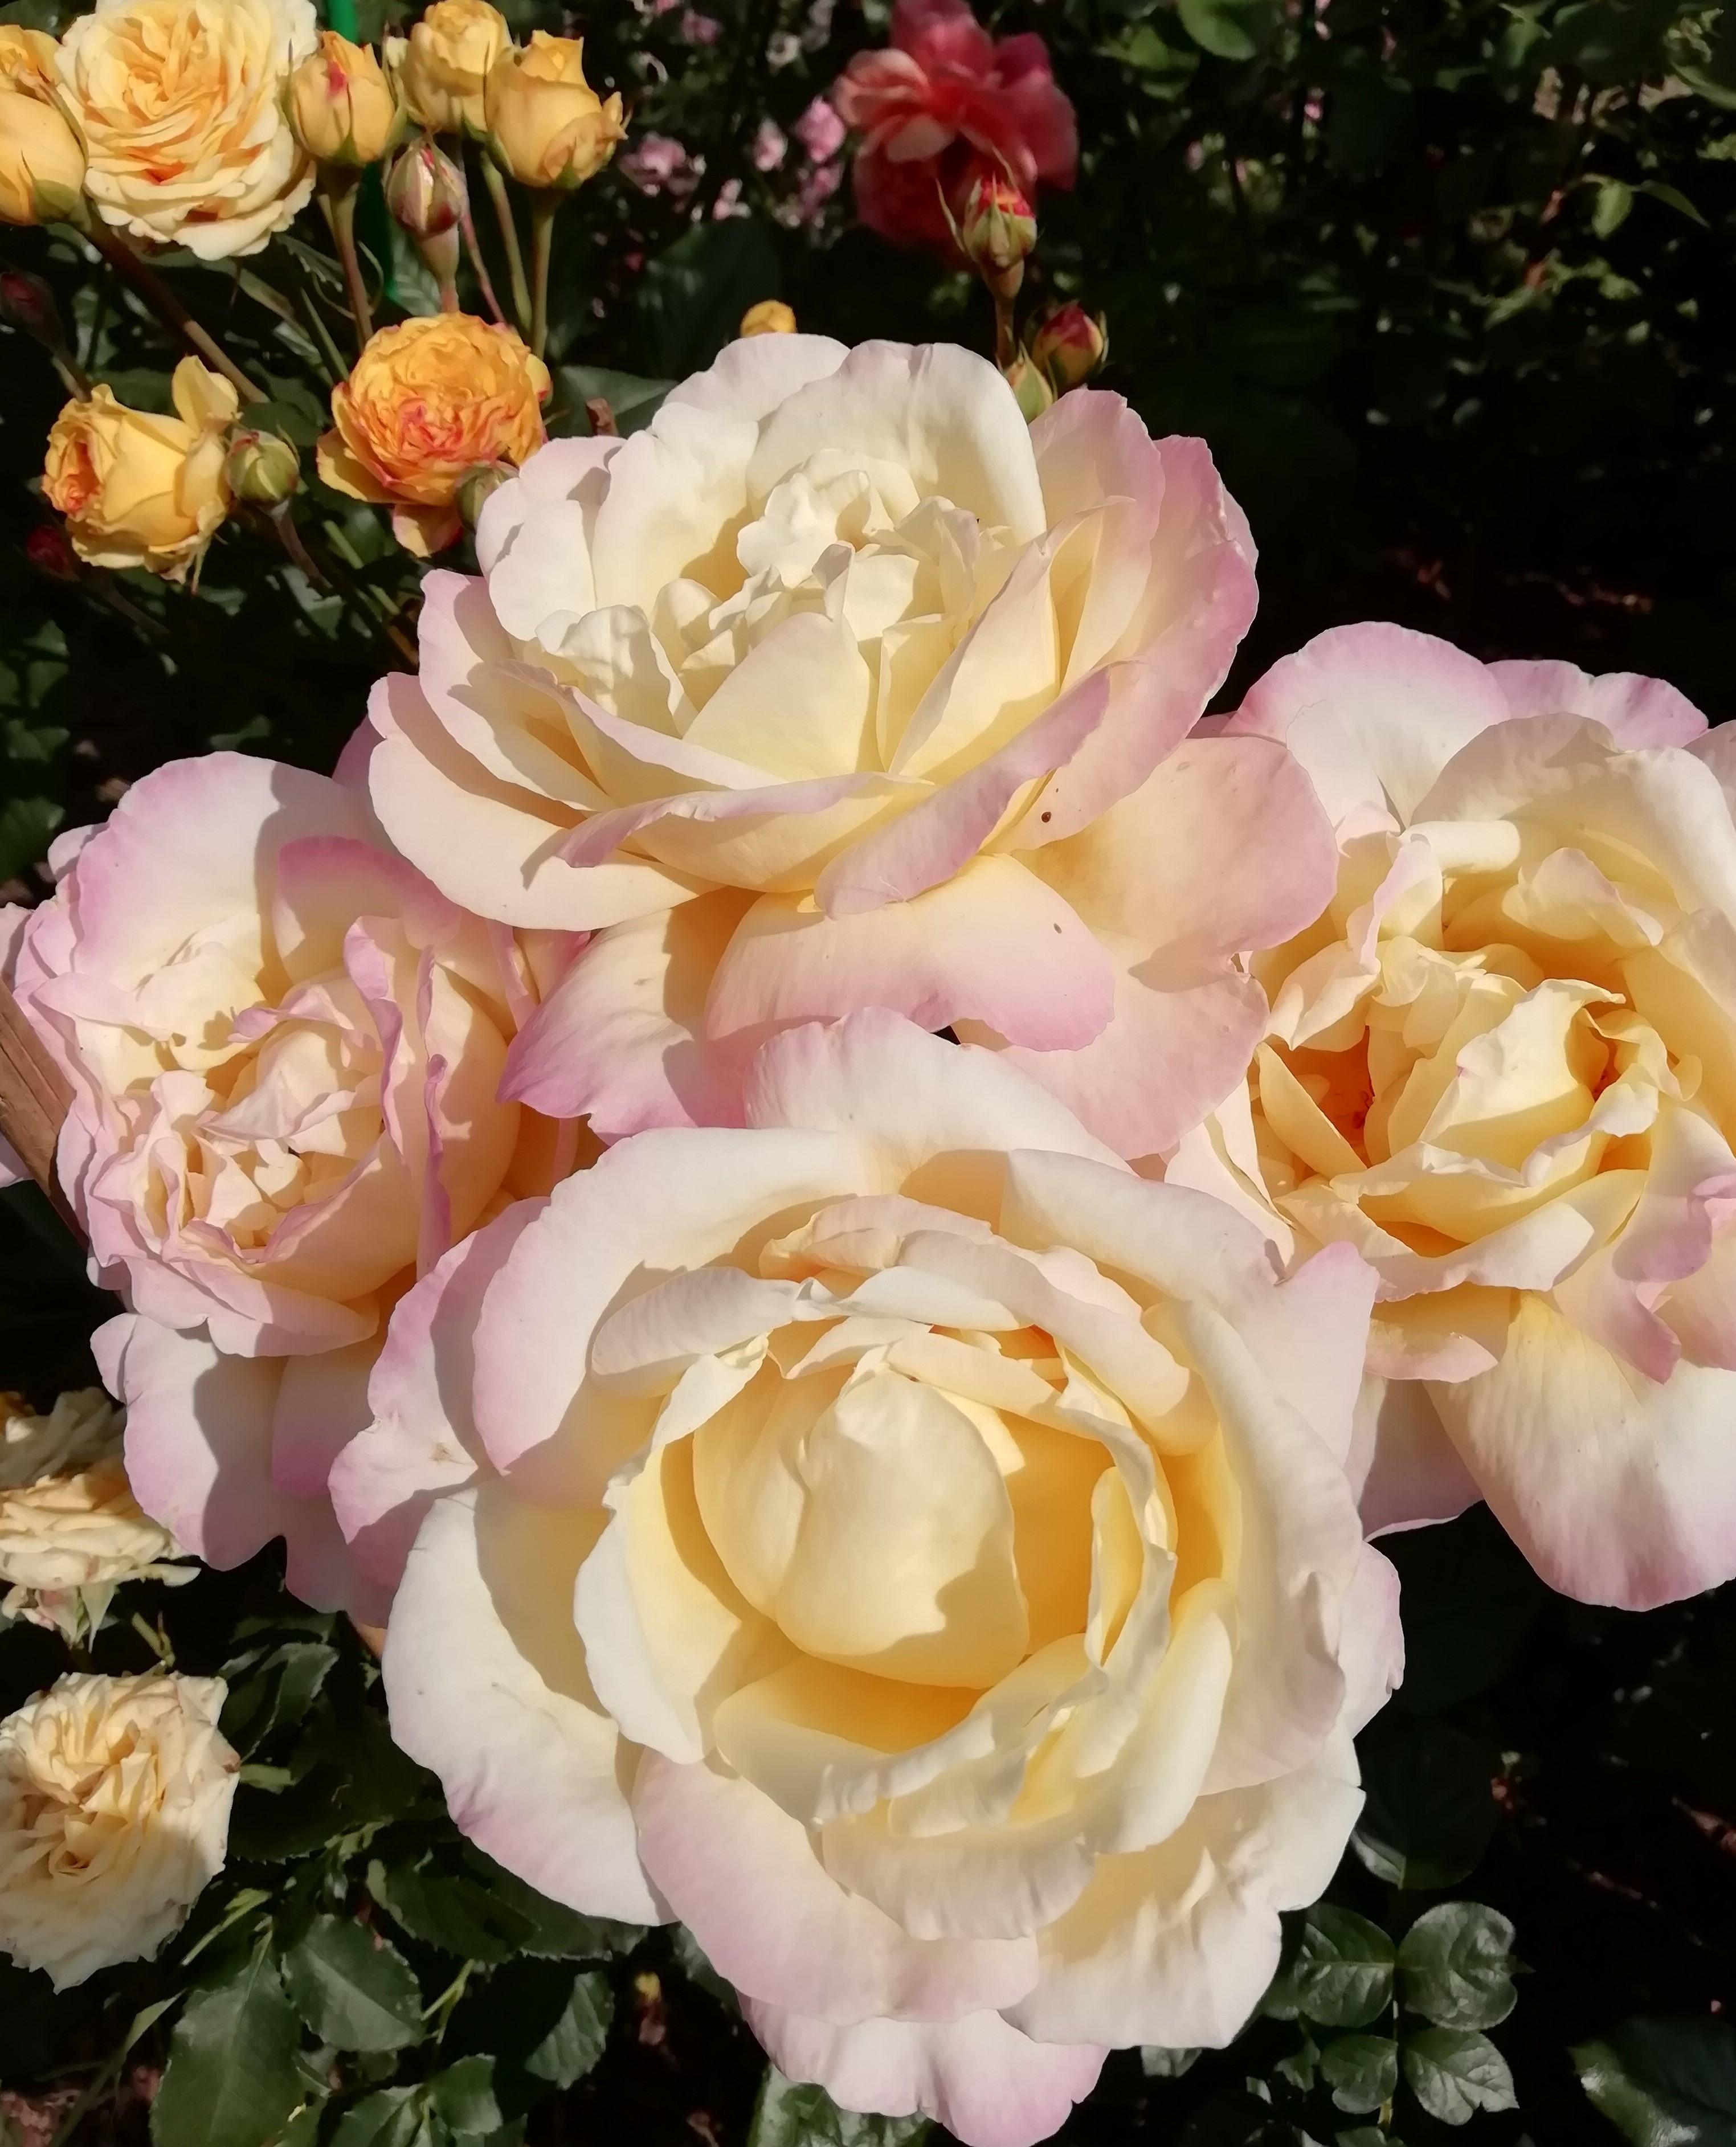 Картинки с розами для глории